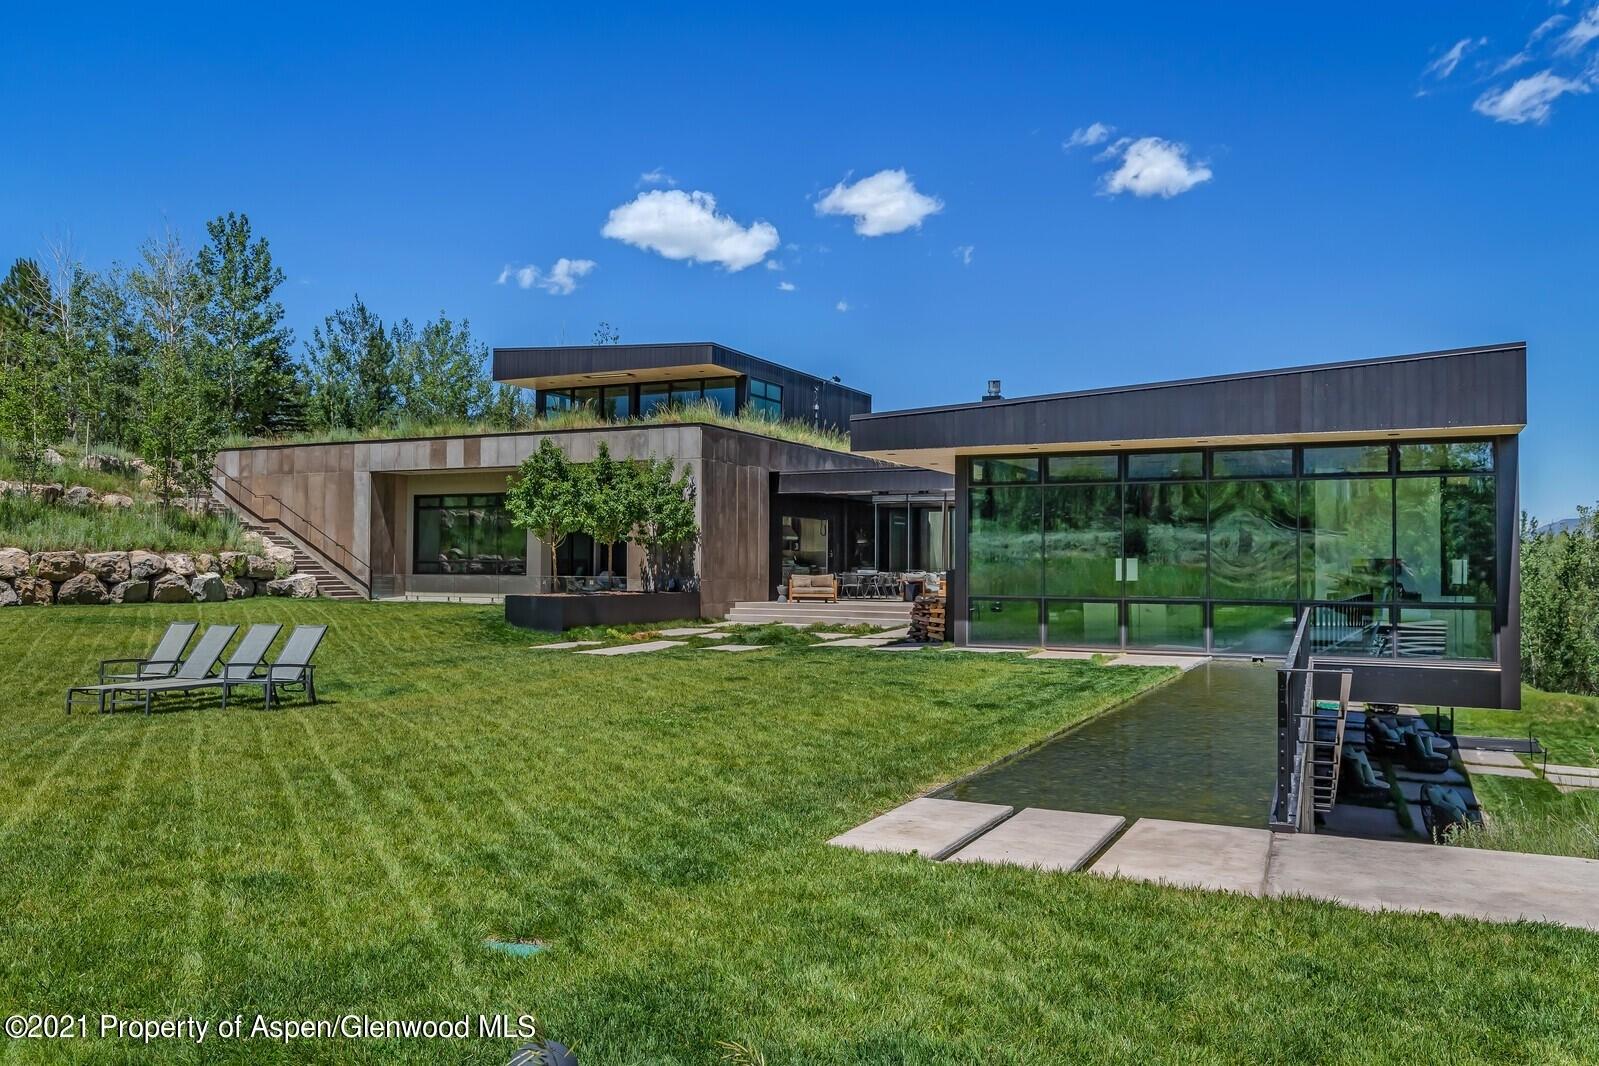 Single Family Home at Aspen, CO 81611